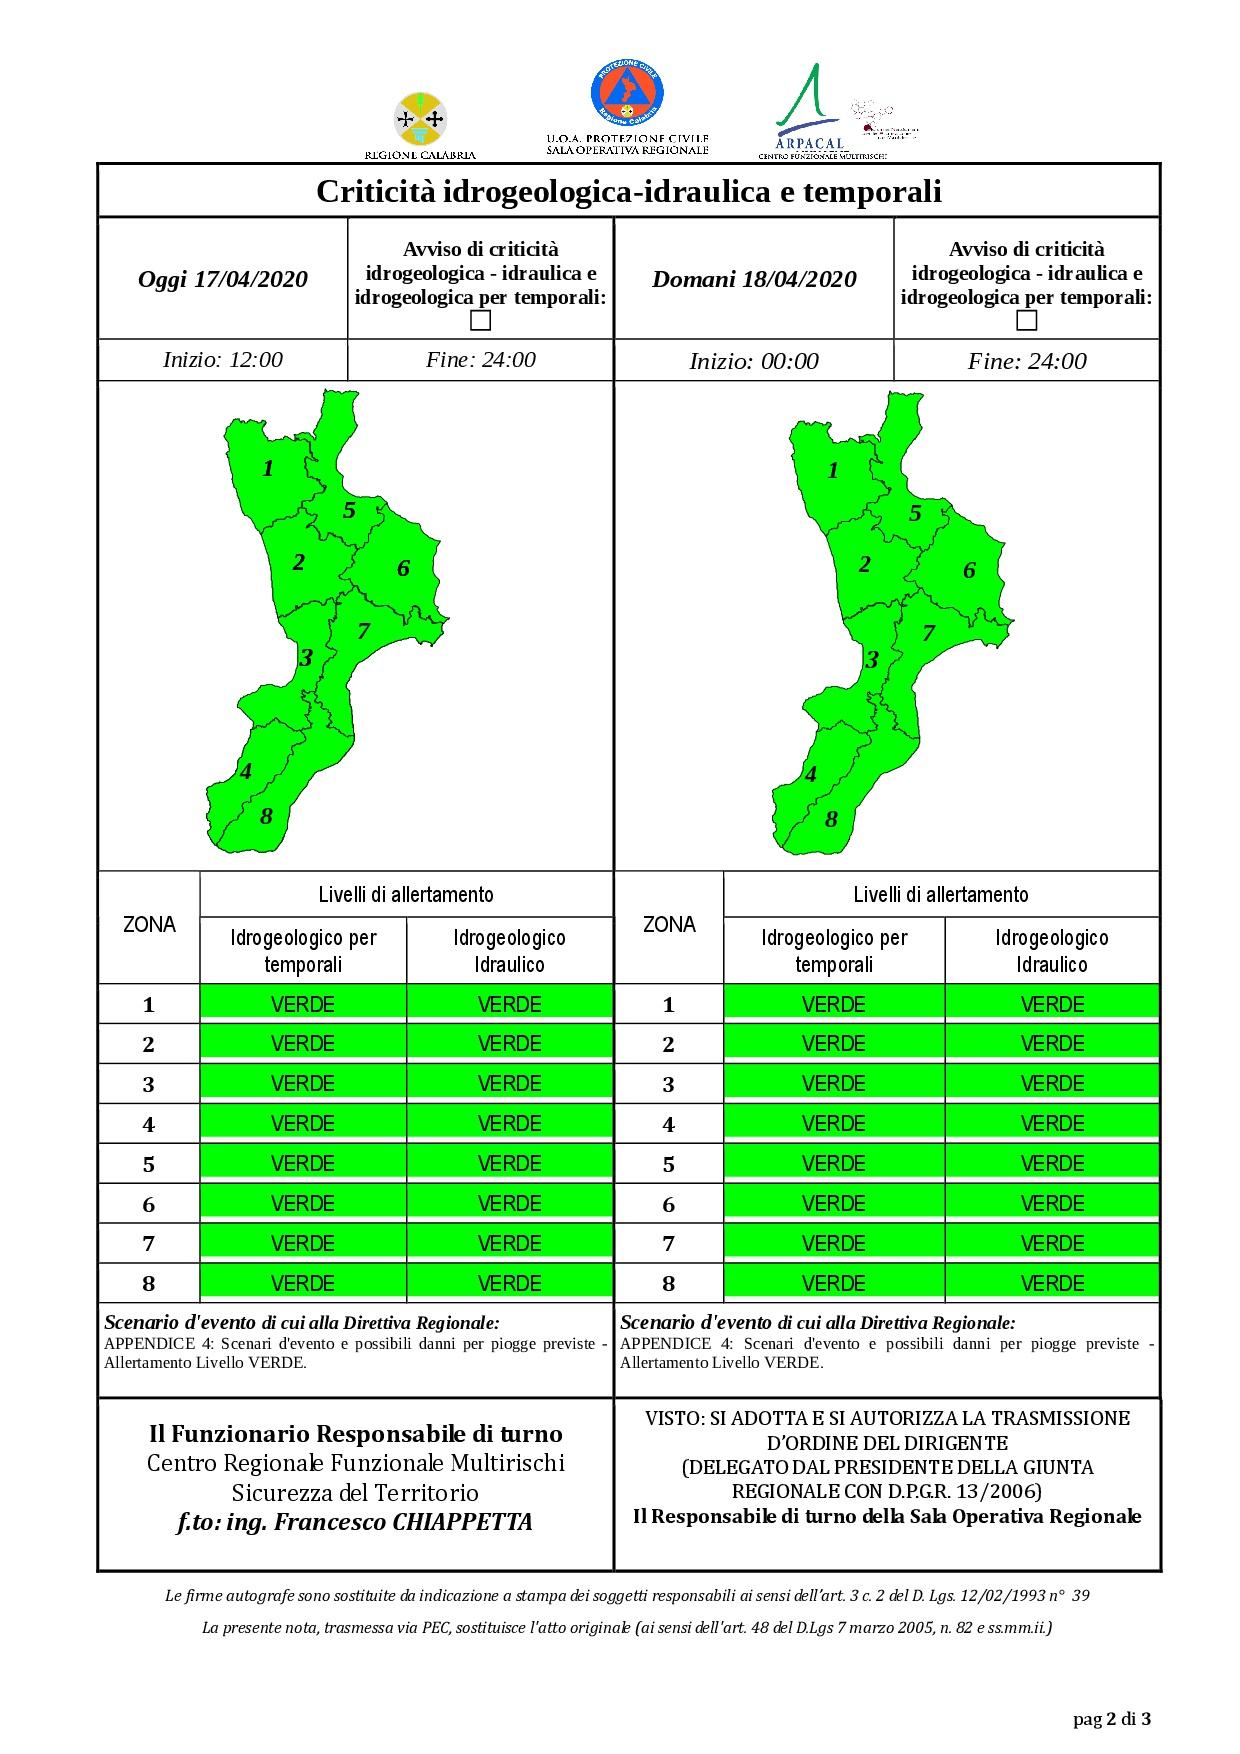 Criticità idrogeologica-idraulica e temporali in Calabria 17-04-2020